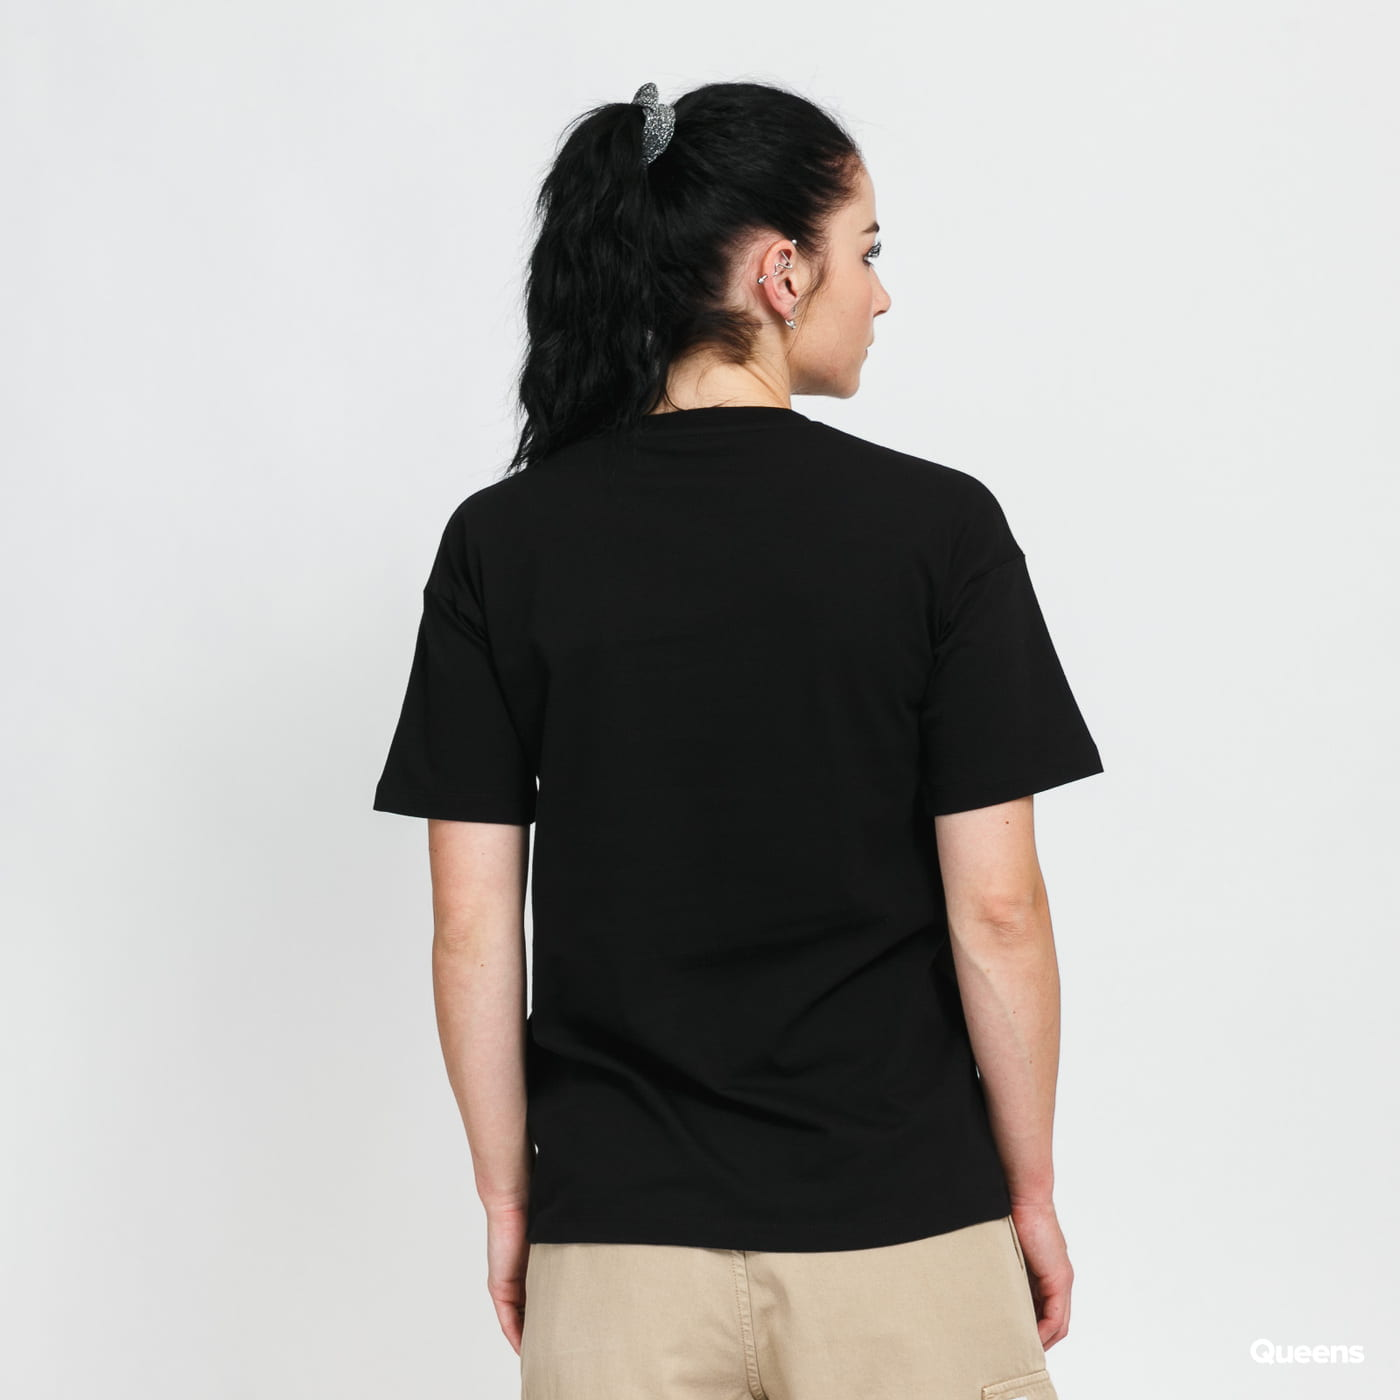 Carhartt WIP W' SS Script T-shirt black stone washed no length